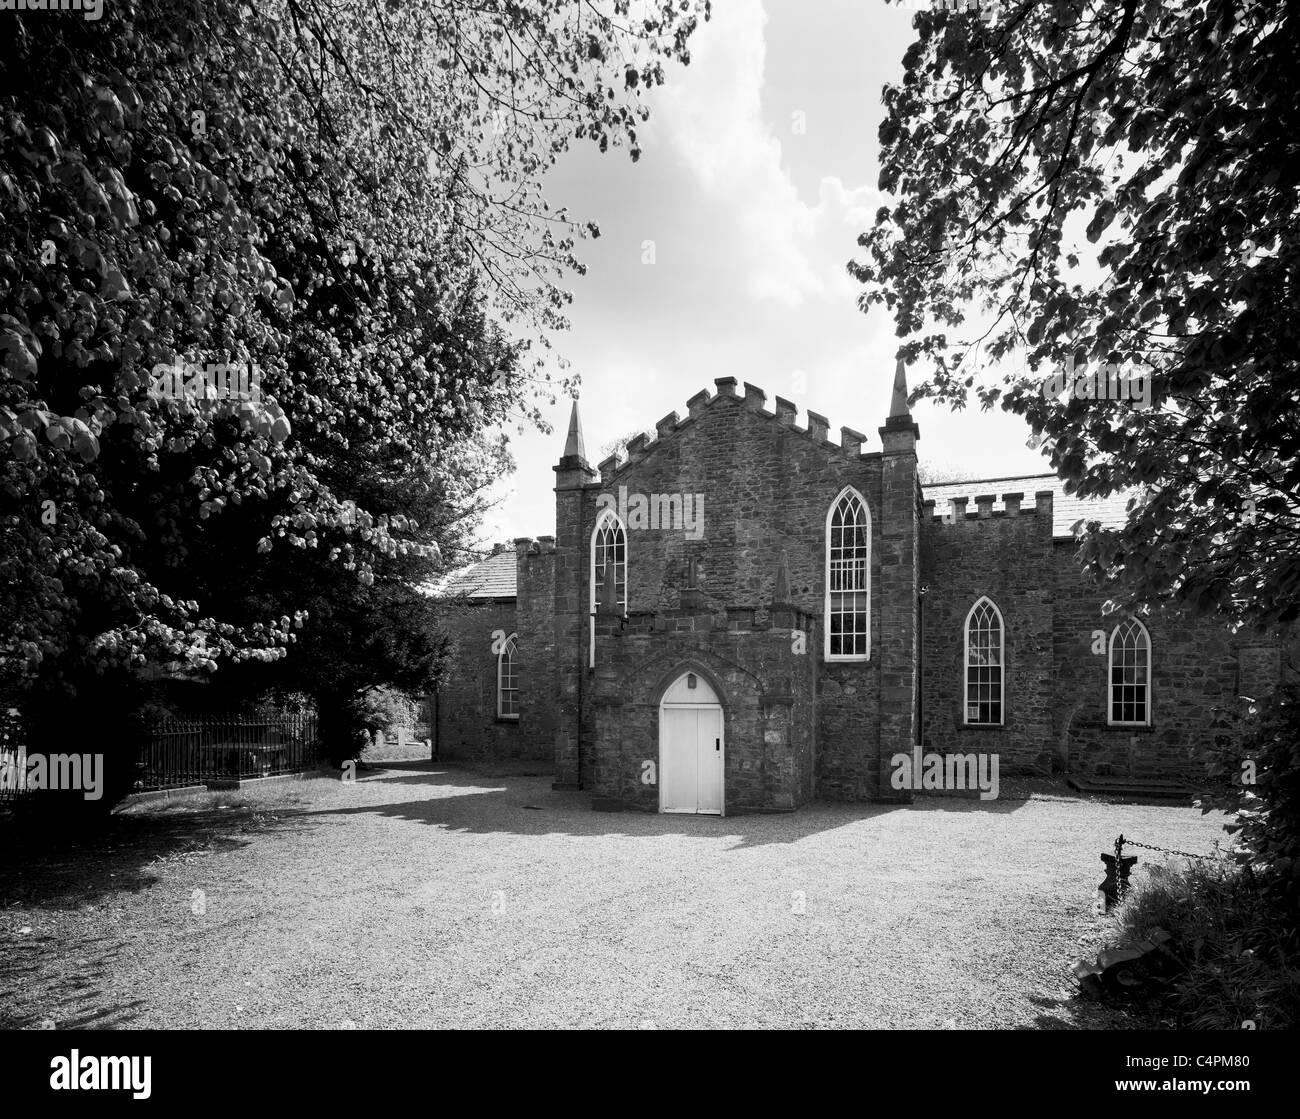 Dublin, Ireland Black History Events | Eventbrite